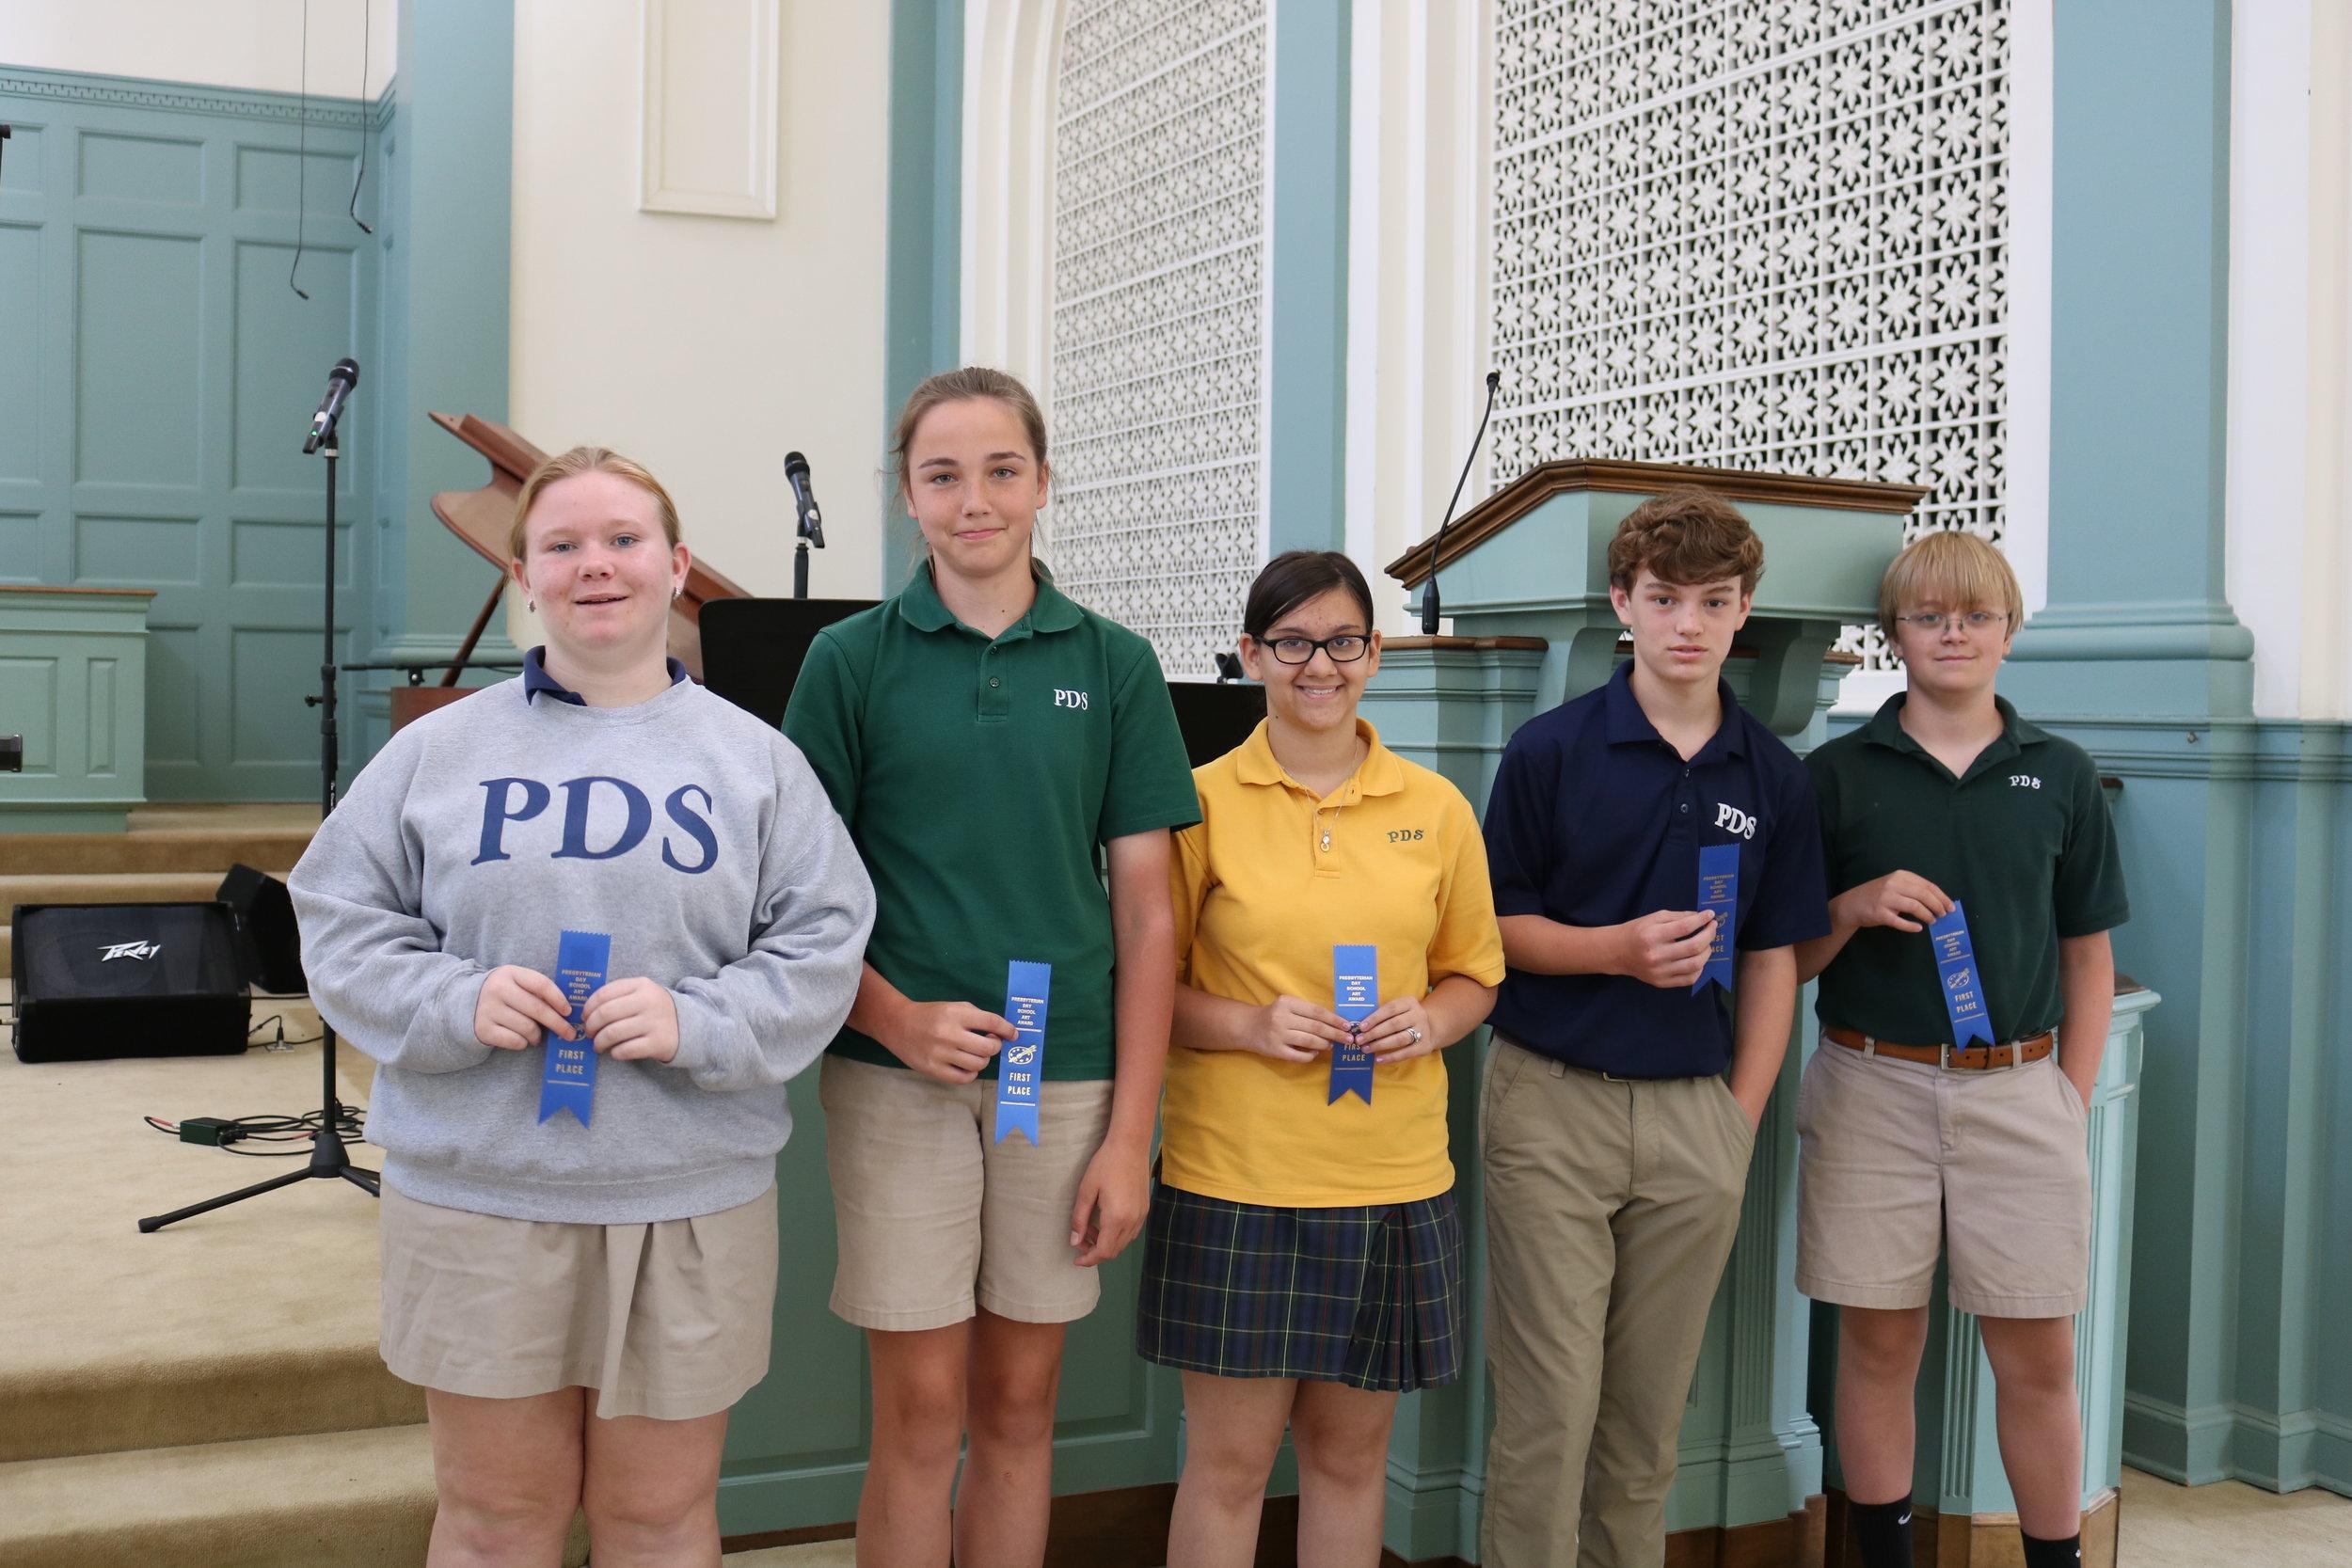 6th grade PDS winners